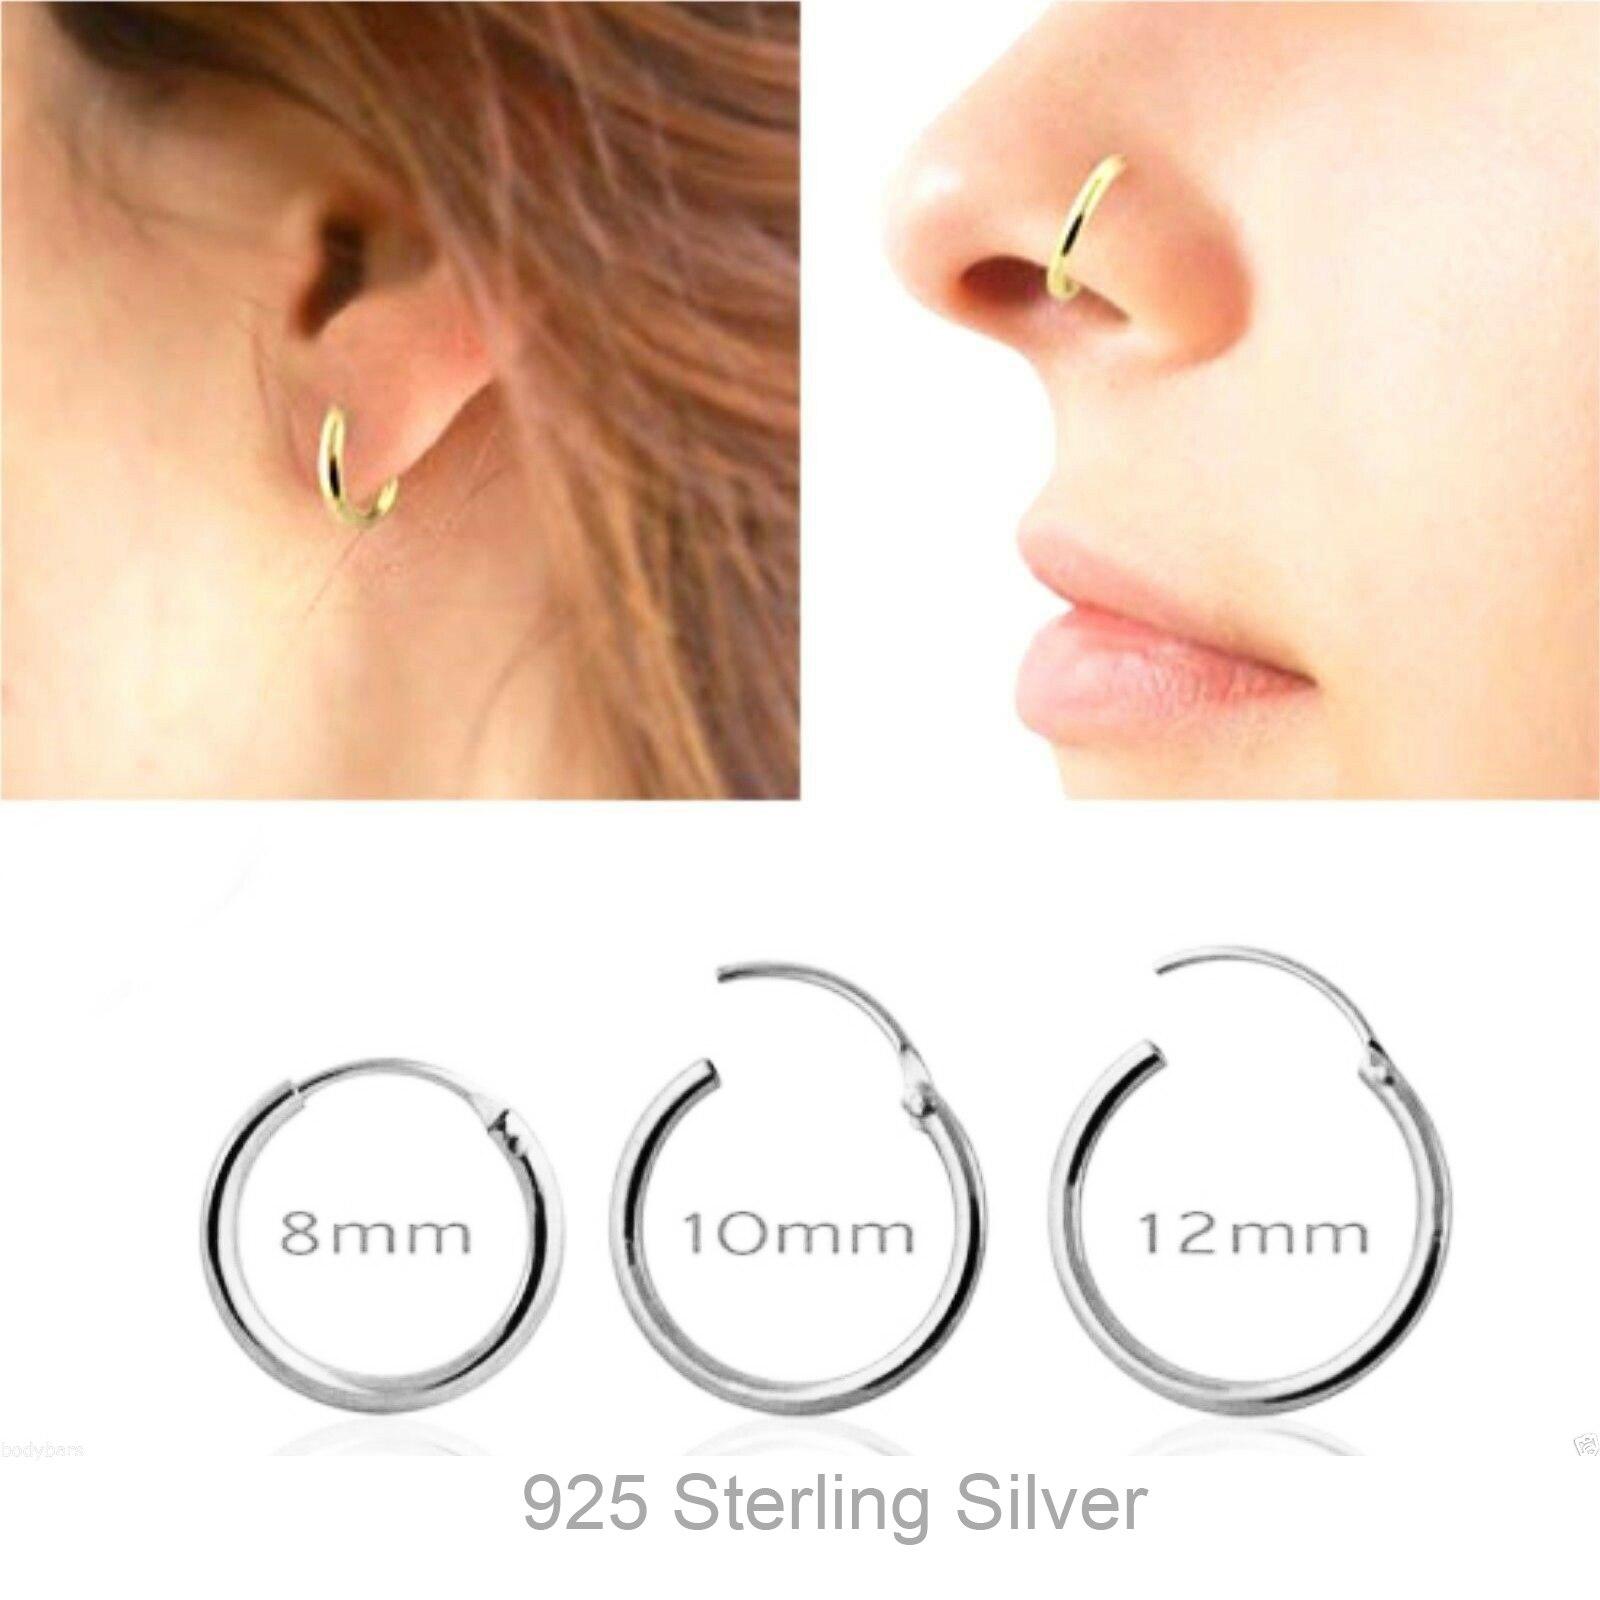 10pcs/lot 925 Sterling Silver Segment Hoop Nose Ring  septum Clicker Tragus Cartilage Ear piercing 8mm 10mm 12mm